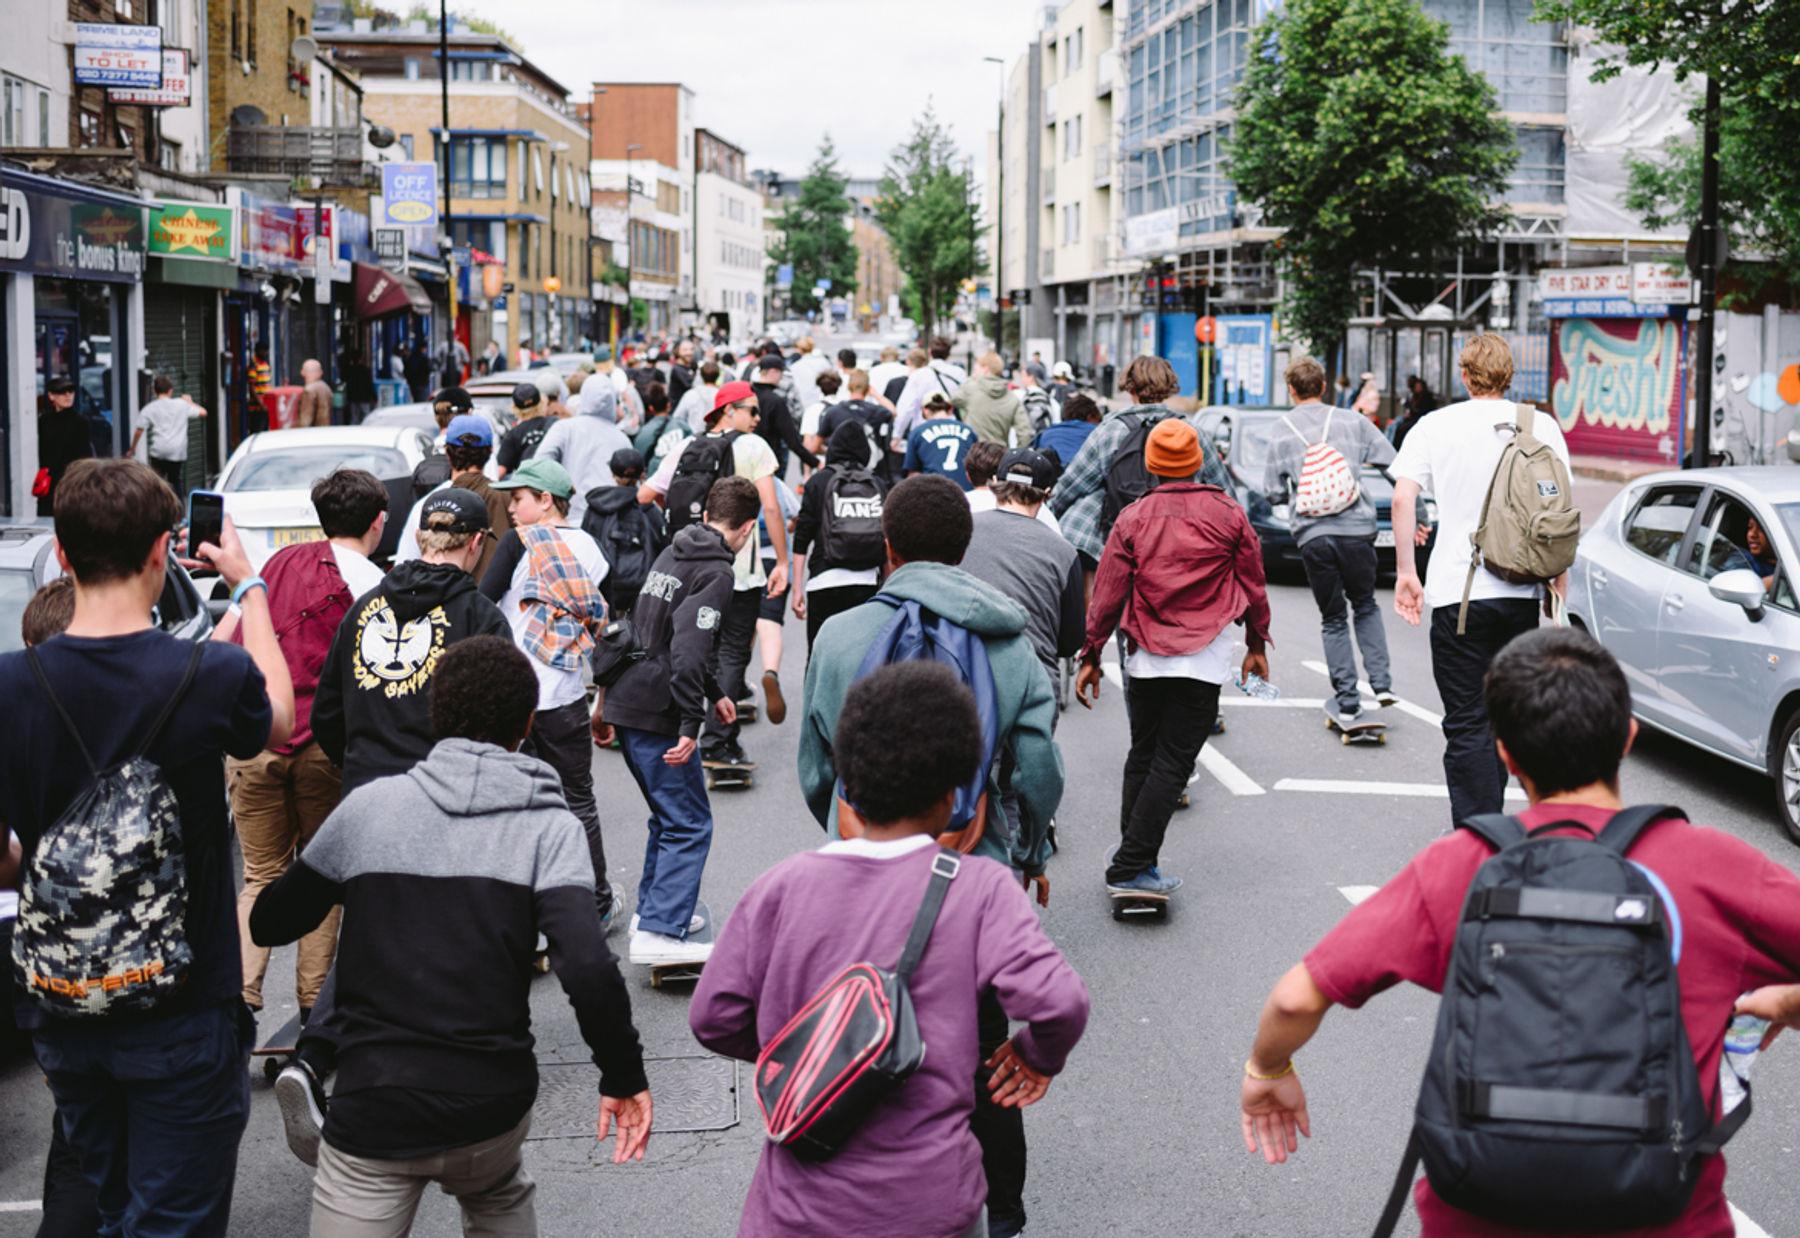 _IHC7428e-Nike-SB-x-Slam-City-Skates-Go-Skateboarding-Day-London-June-2015-Photographer-Maksim-Kalanep